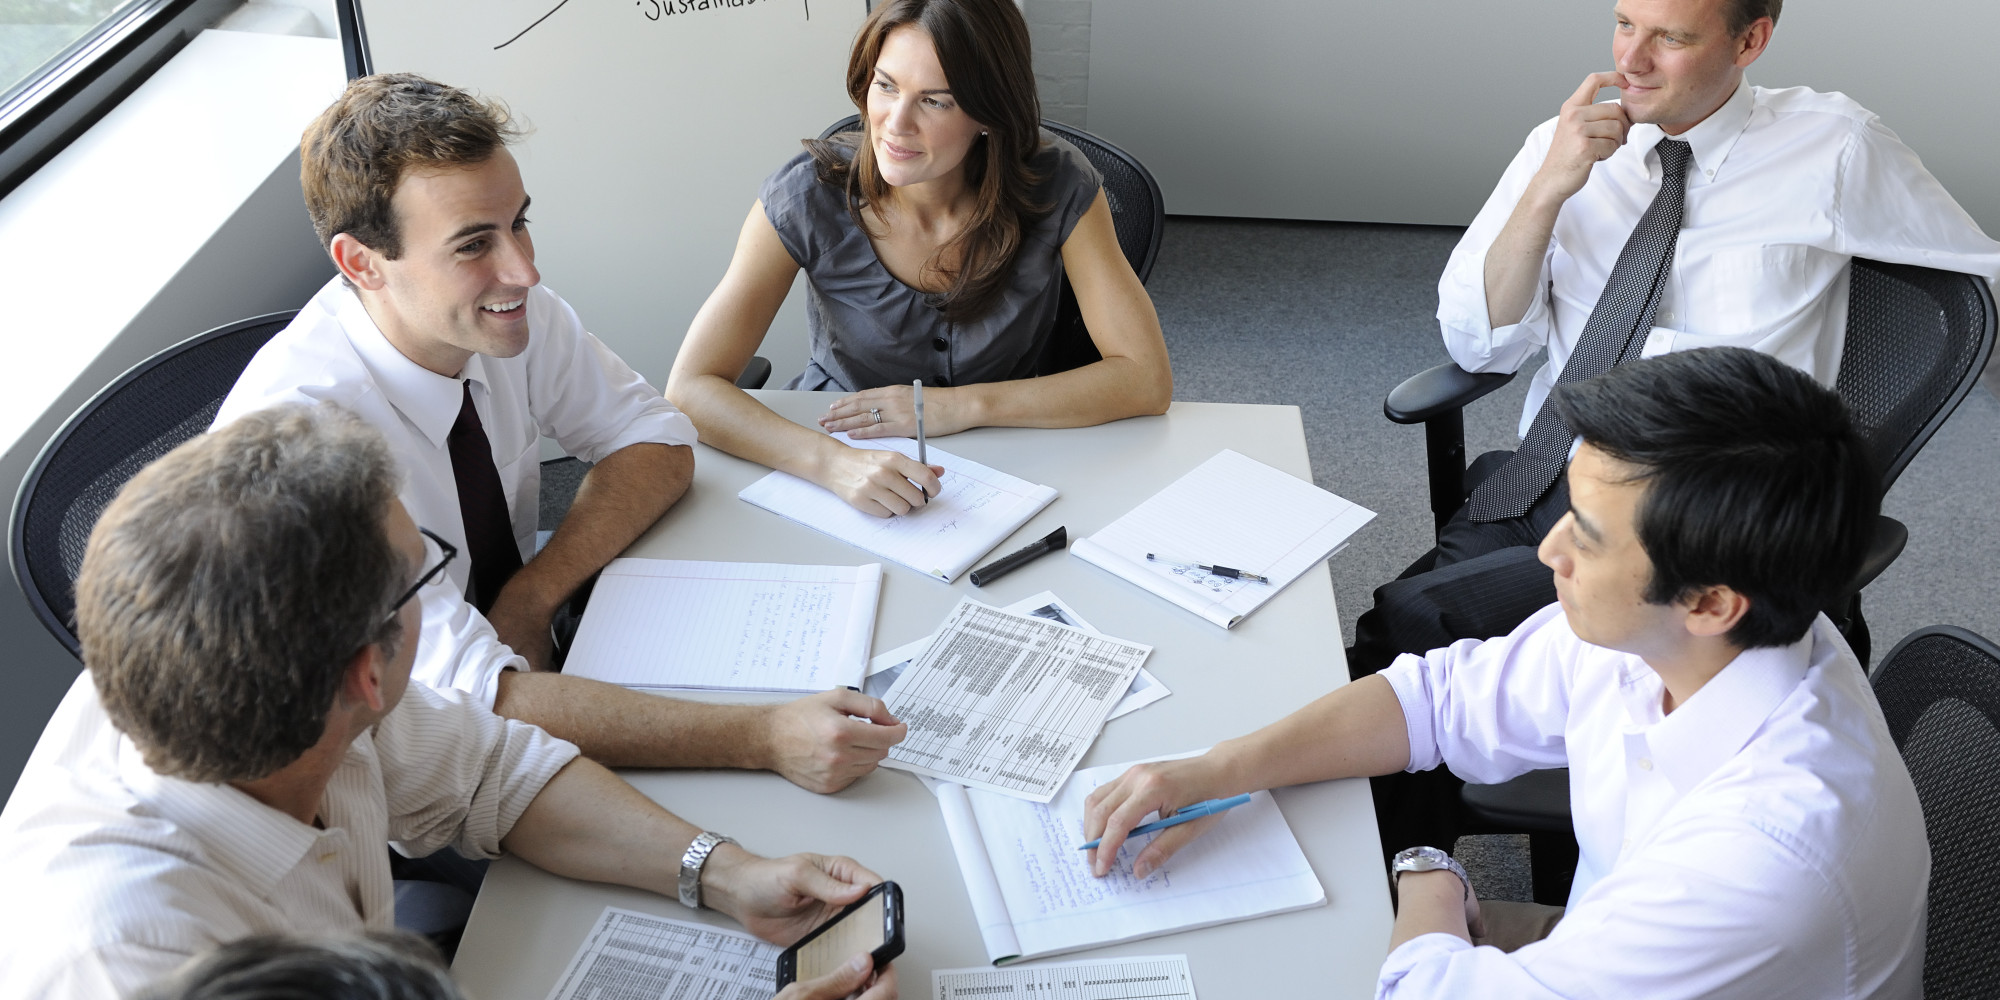 Http Www Huffingtonpost Com Amy Arndt 8 Business Etiquette Tips B 4665674 Html